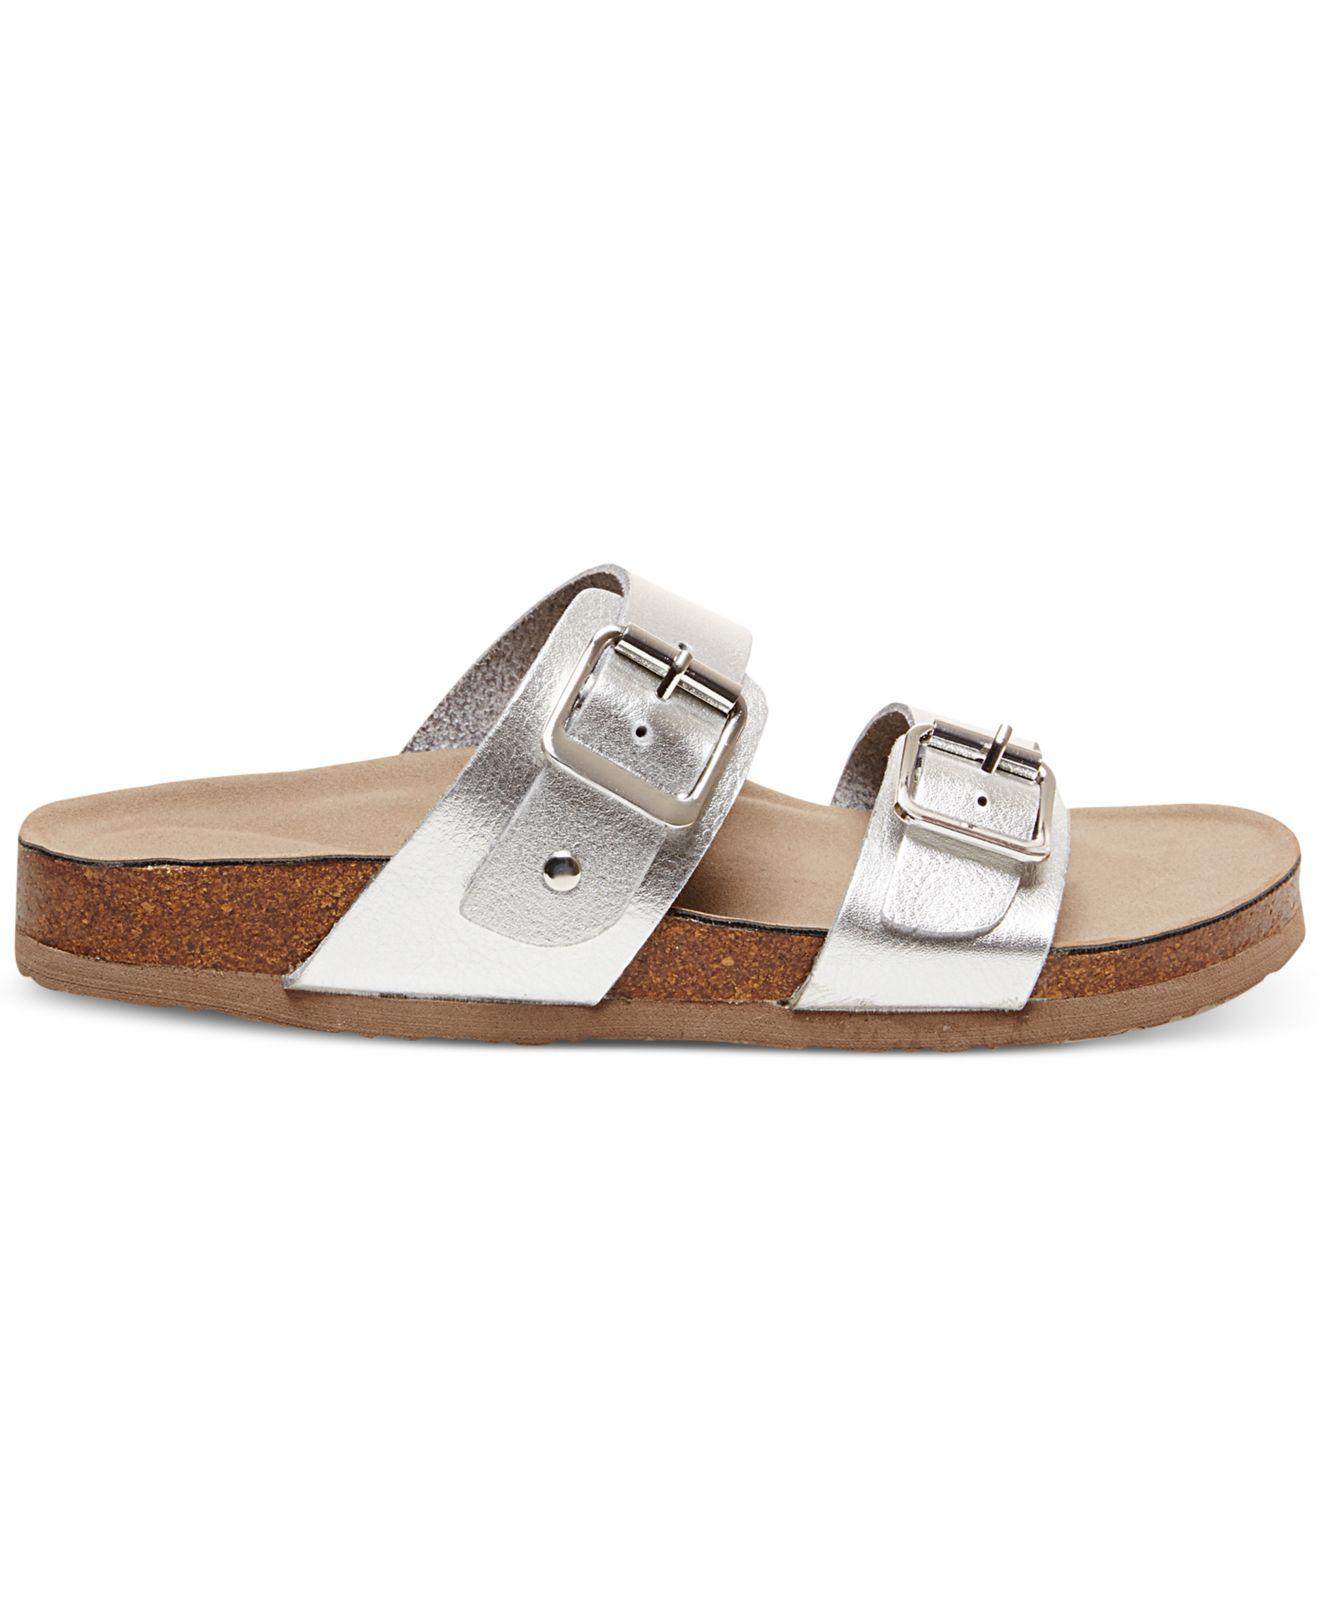 bcef984a093 Madden Girl Metallic Brando Footbed Sandals